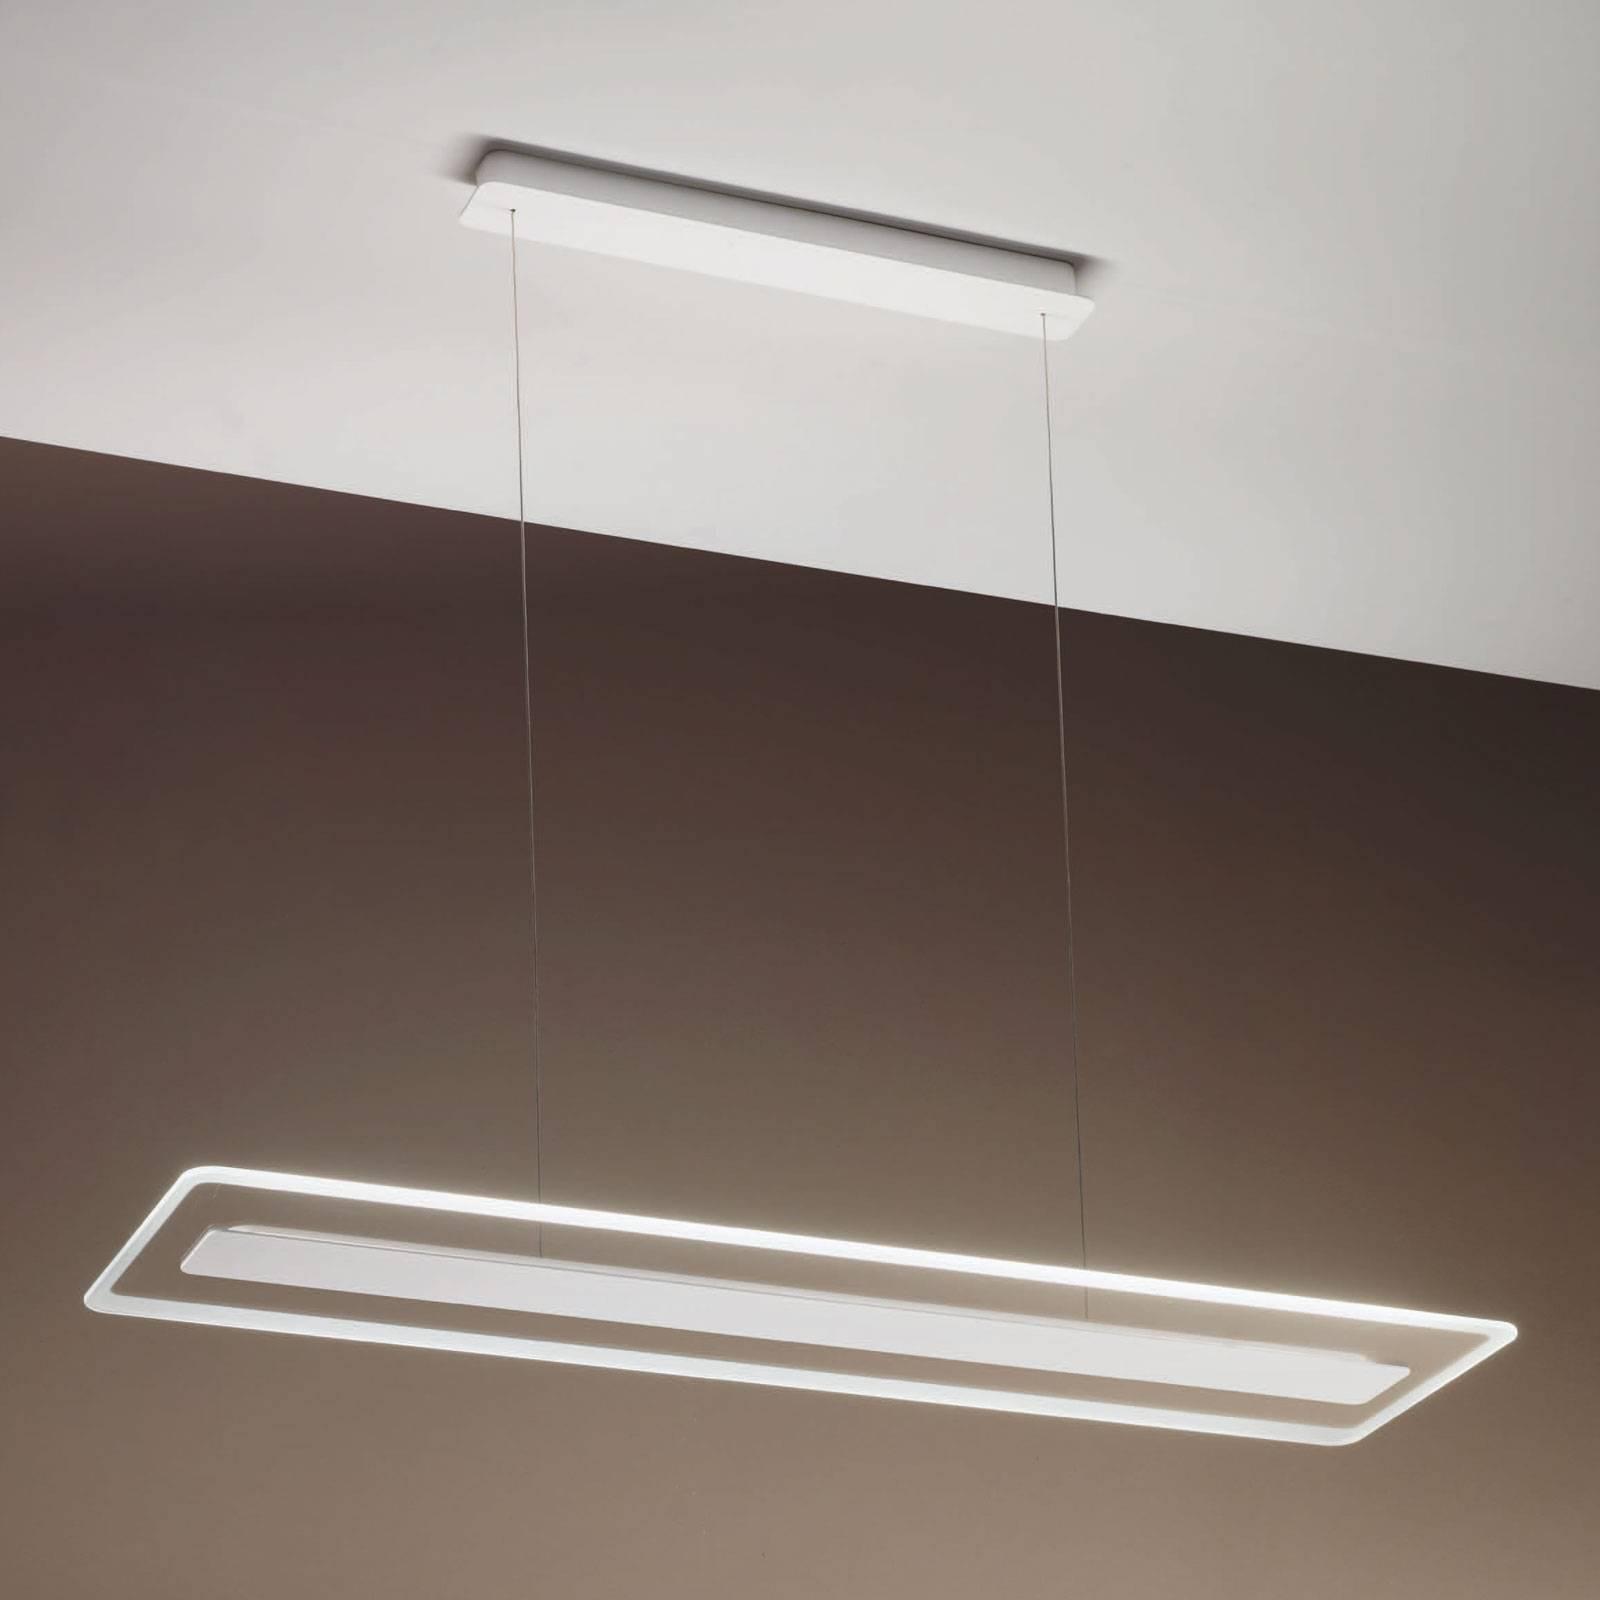 LED hanglamp Antille, glas, rechthoekig, chroom